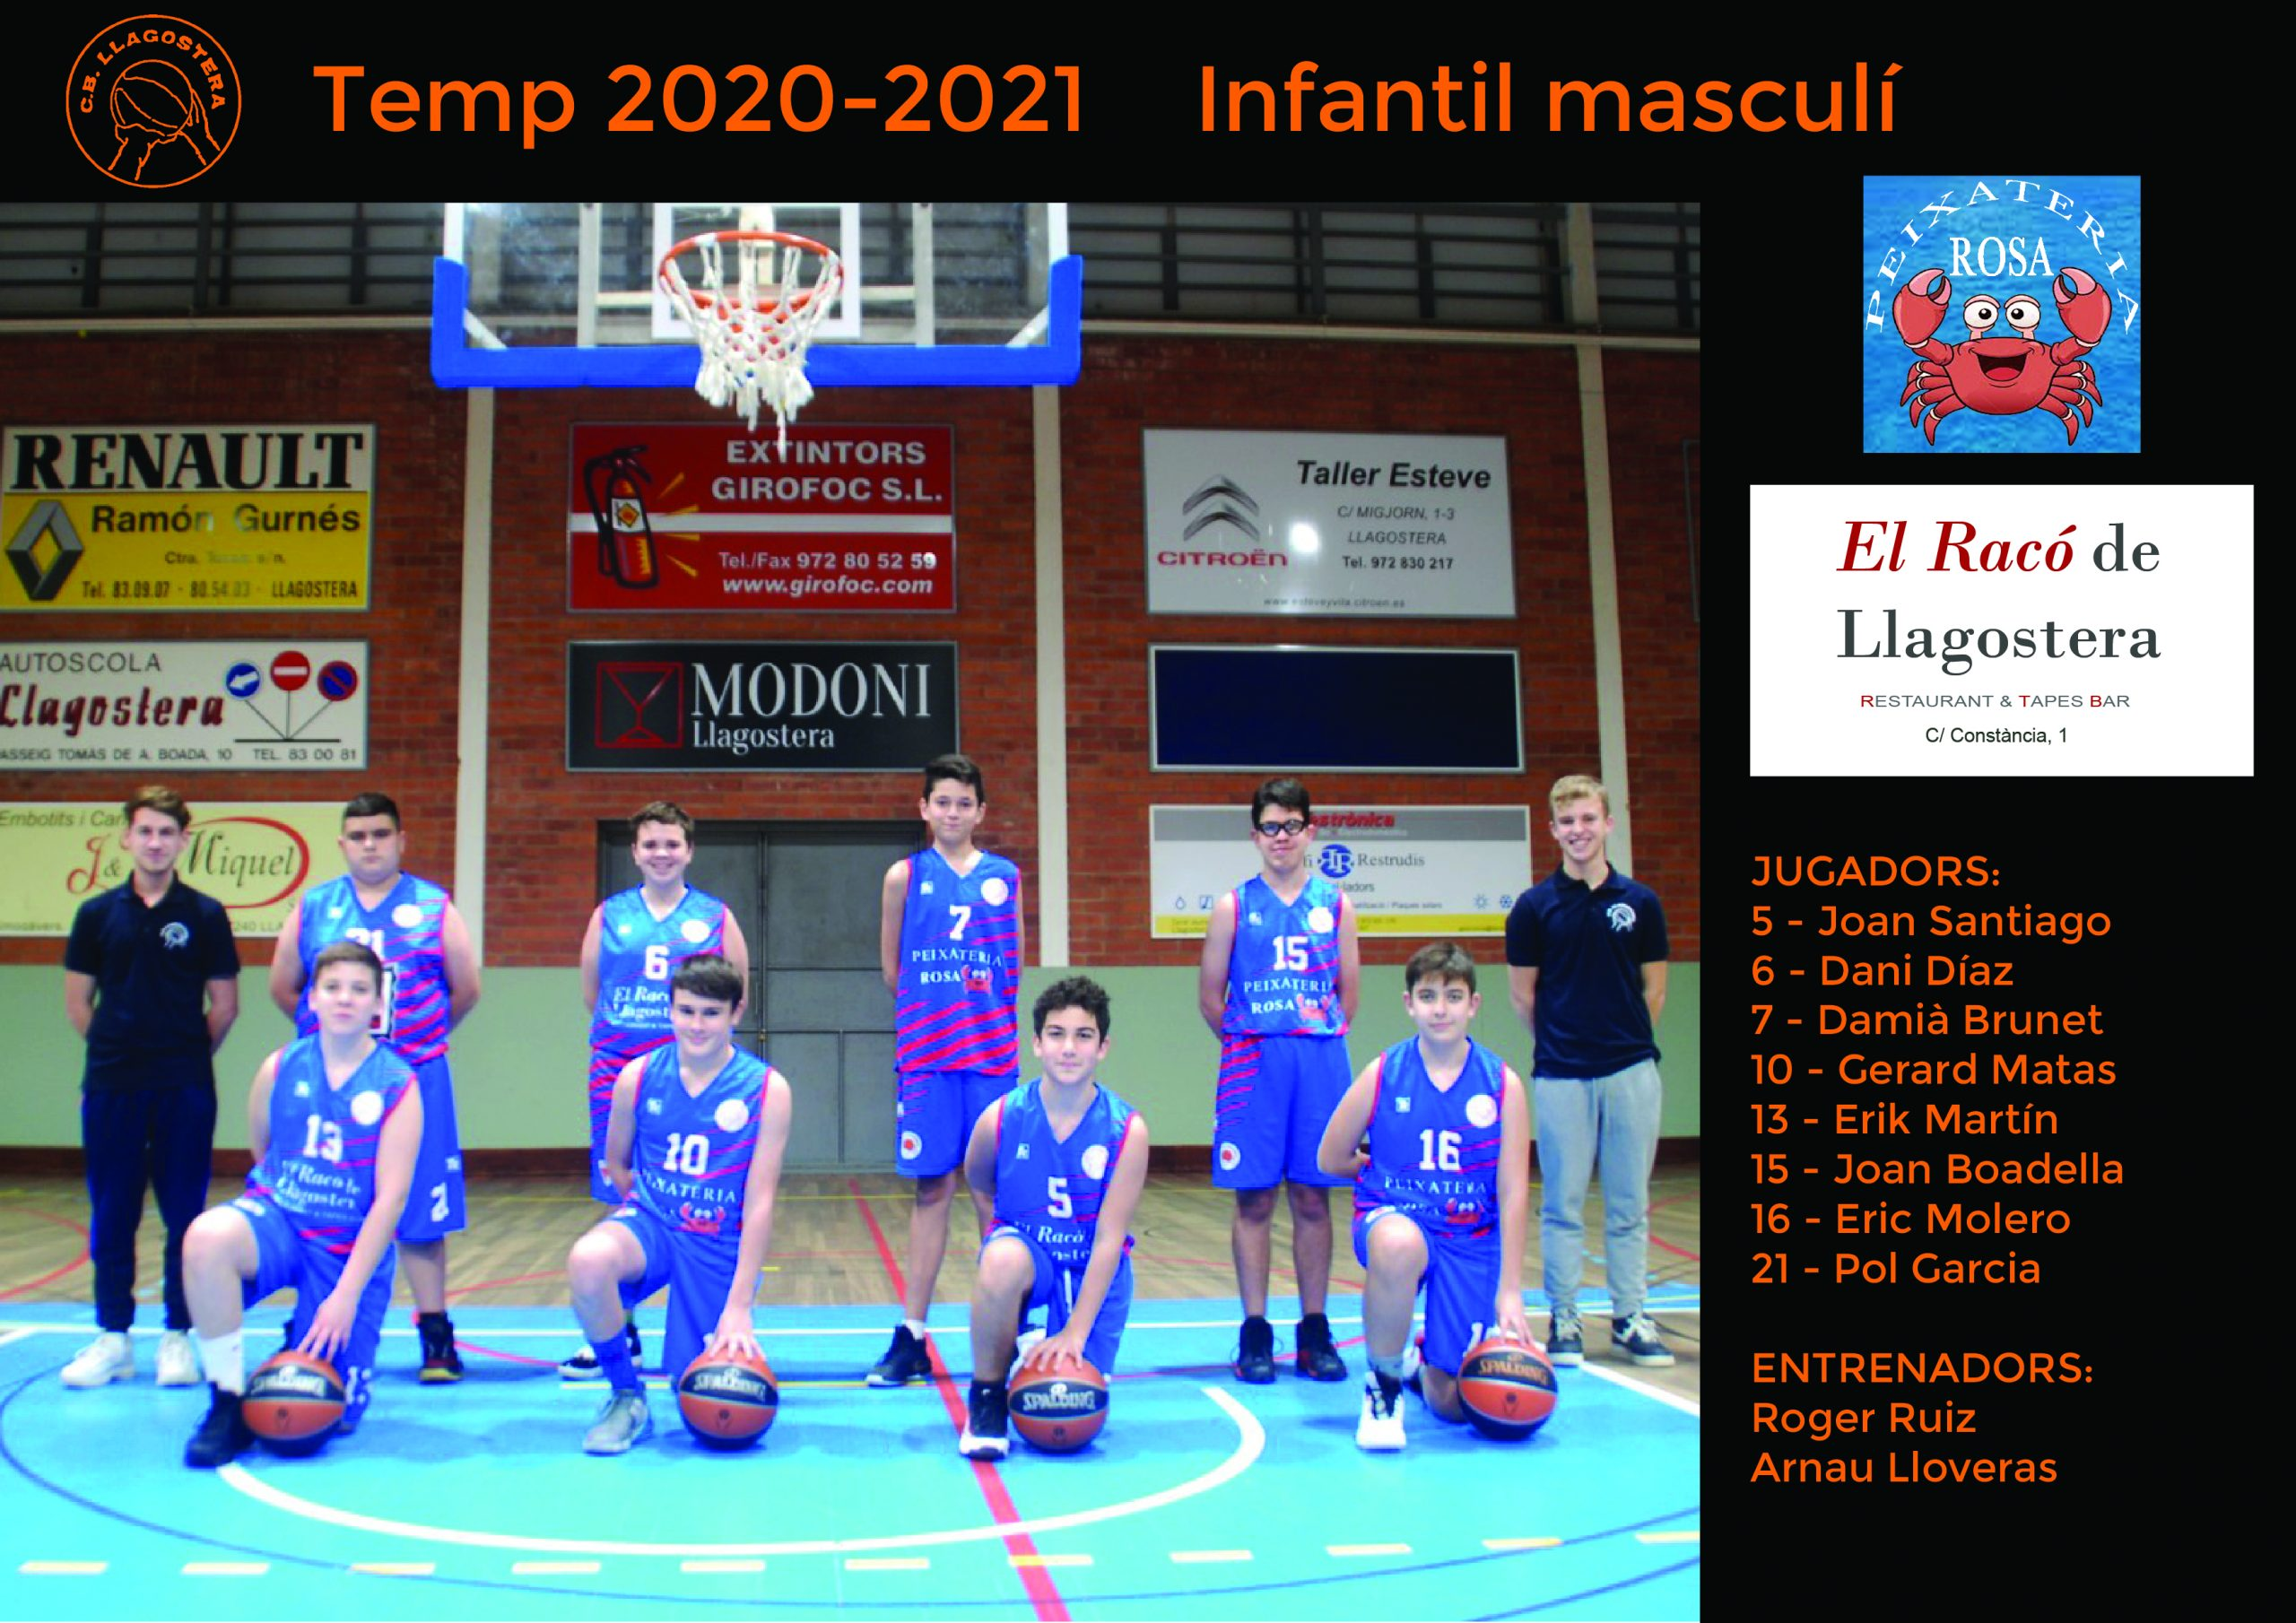 http://www.cbllagostera.com/wp-content/uploads/2021/04/InfantilMasculi_A4-01-scaled.jpg